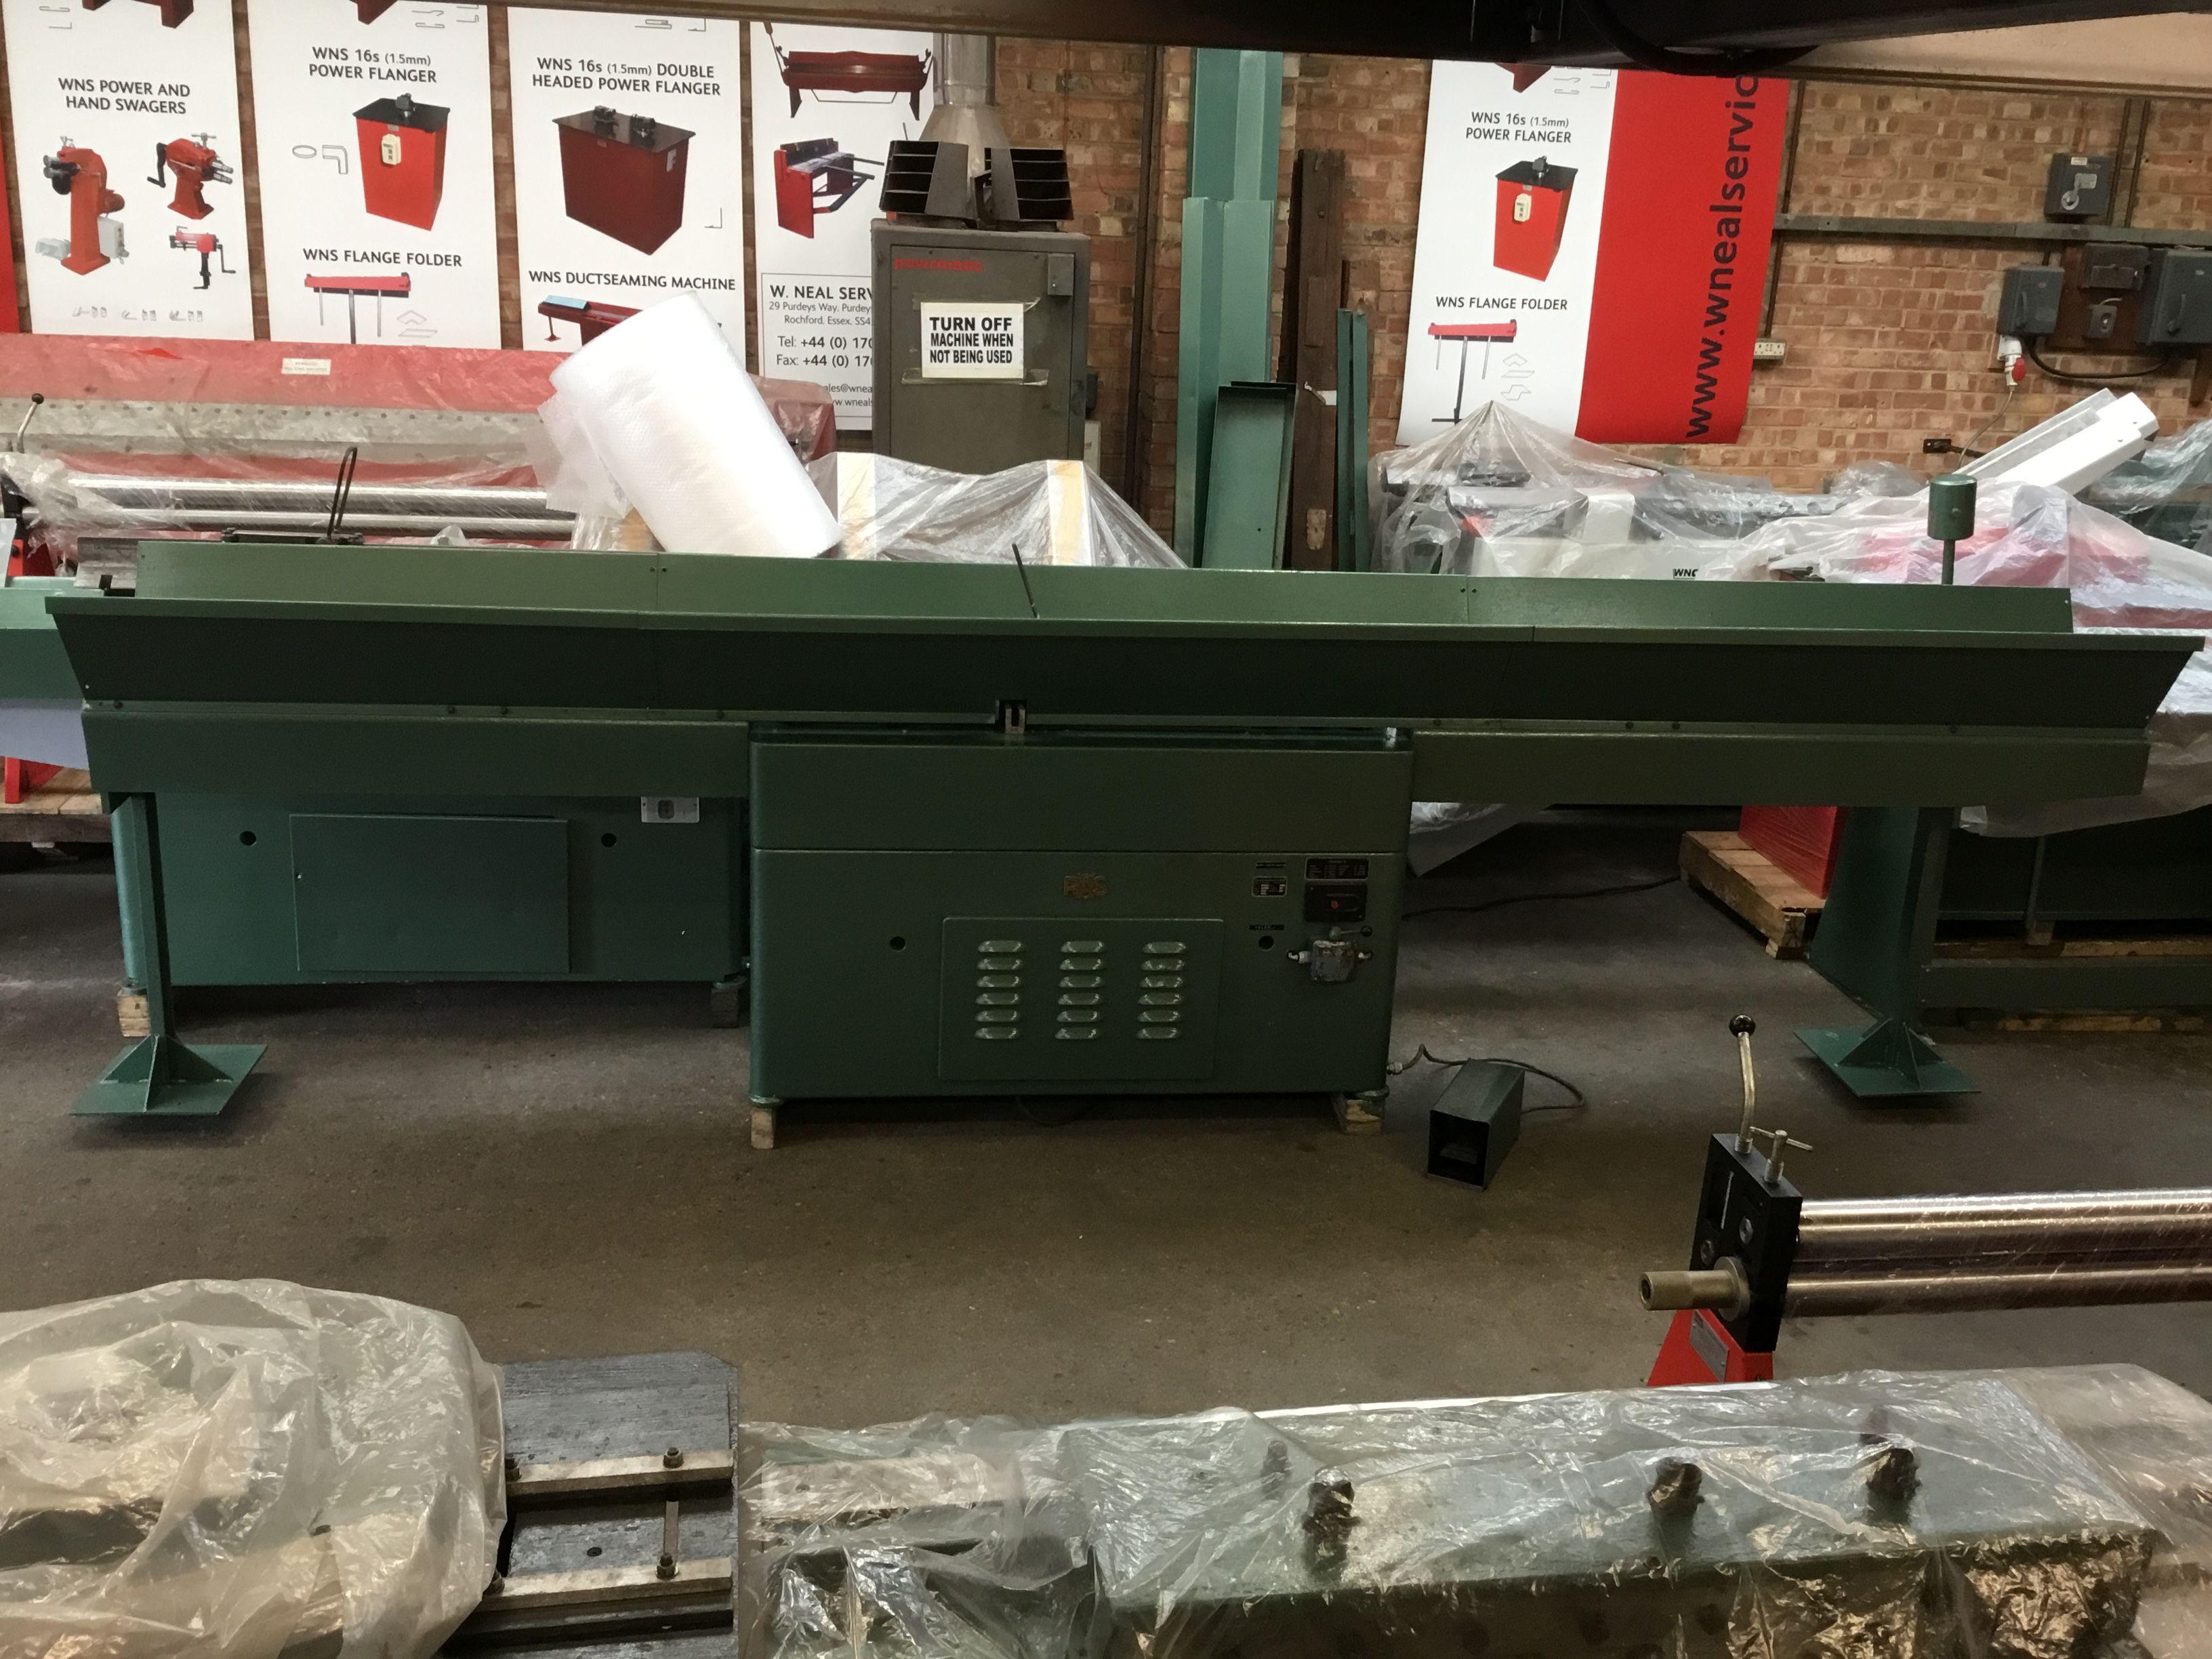 Ras Ductseamer Duct Seamer Seaming Machine 22 81 Machine Service Metal Working Manufacturing